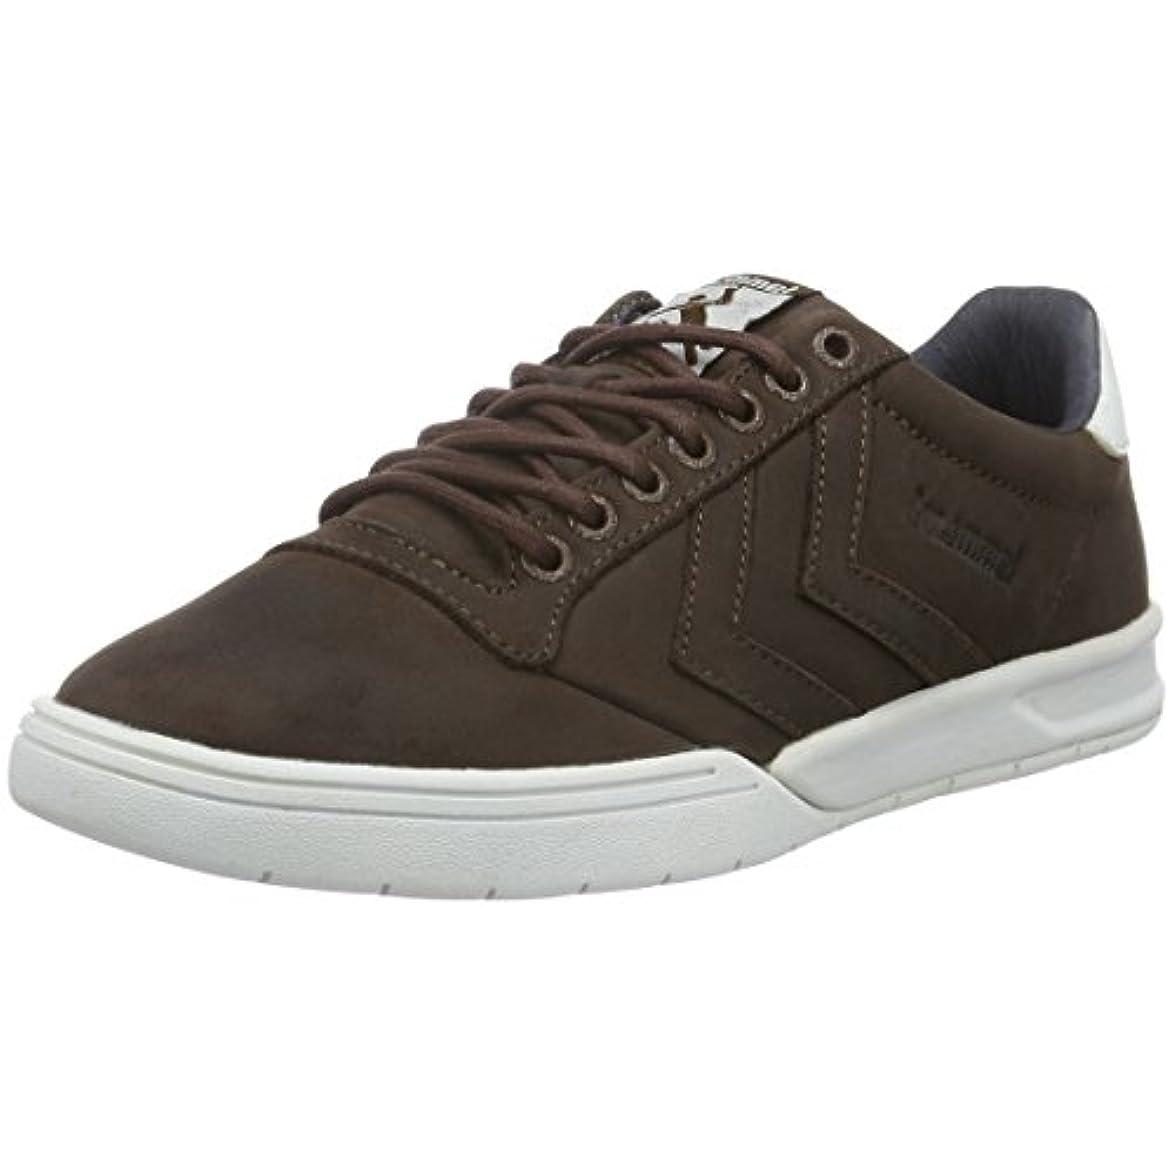 Hummel Hml Stadil Winter Low Sneaker Scarpe Da Ginnastica Basse Unisex-adulto